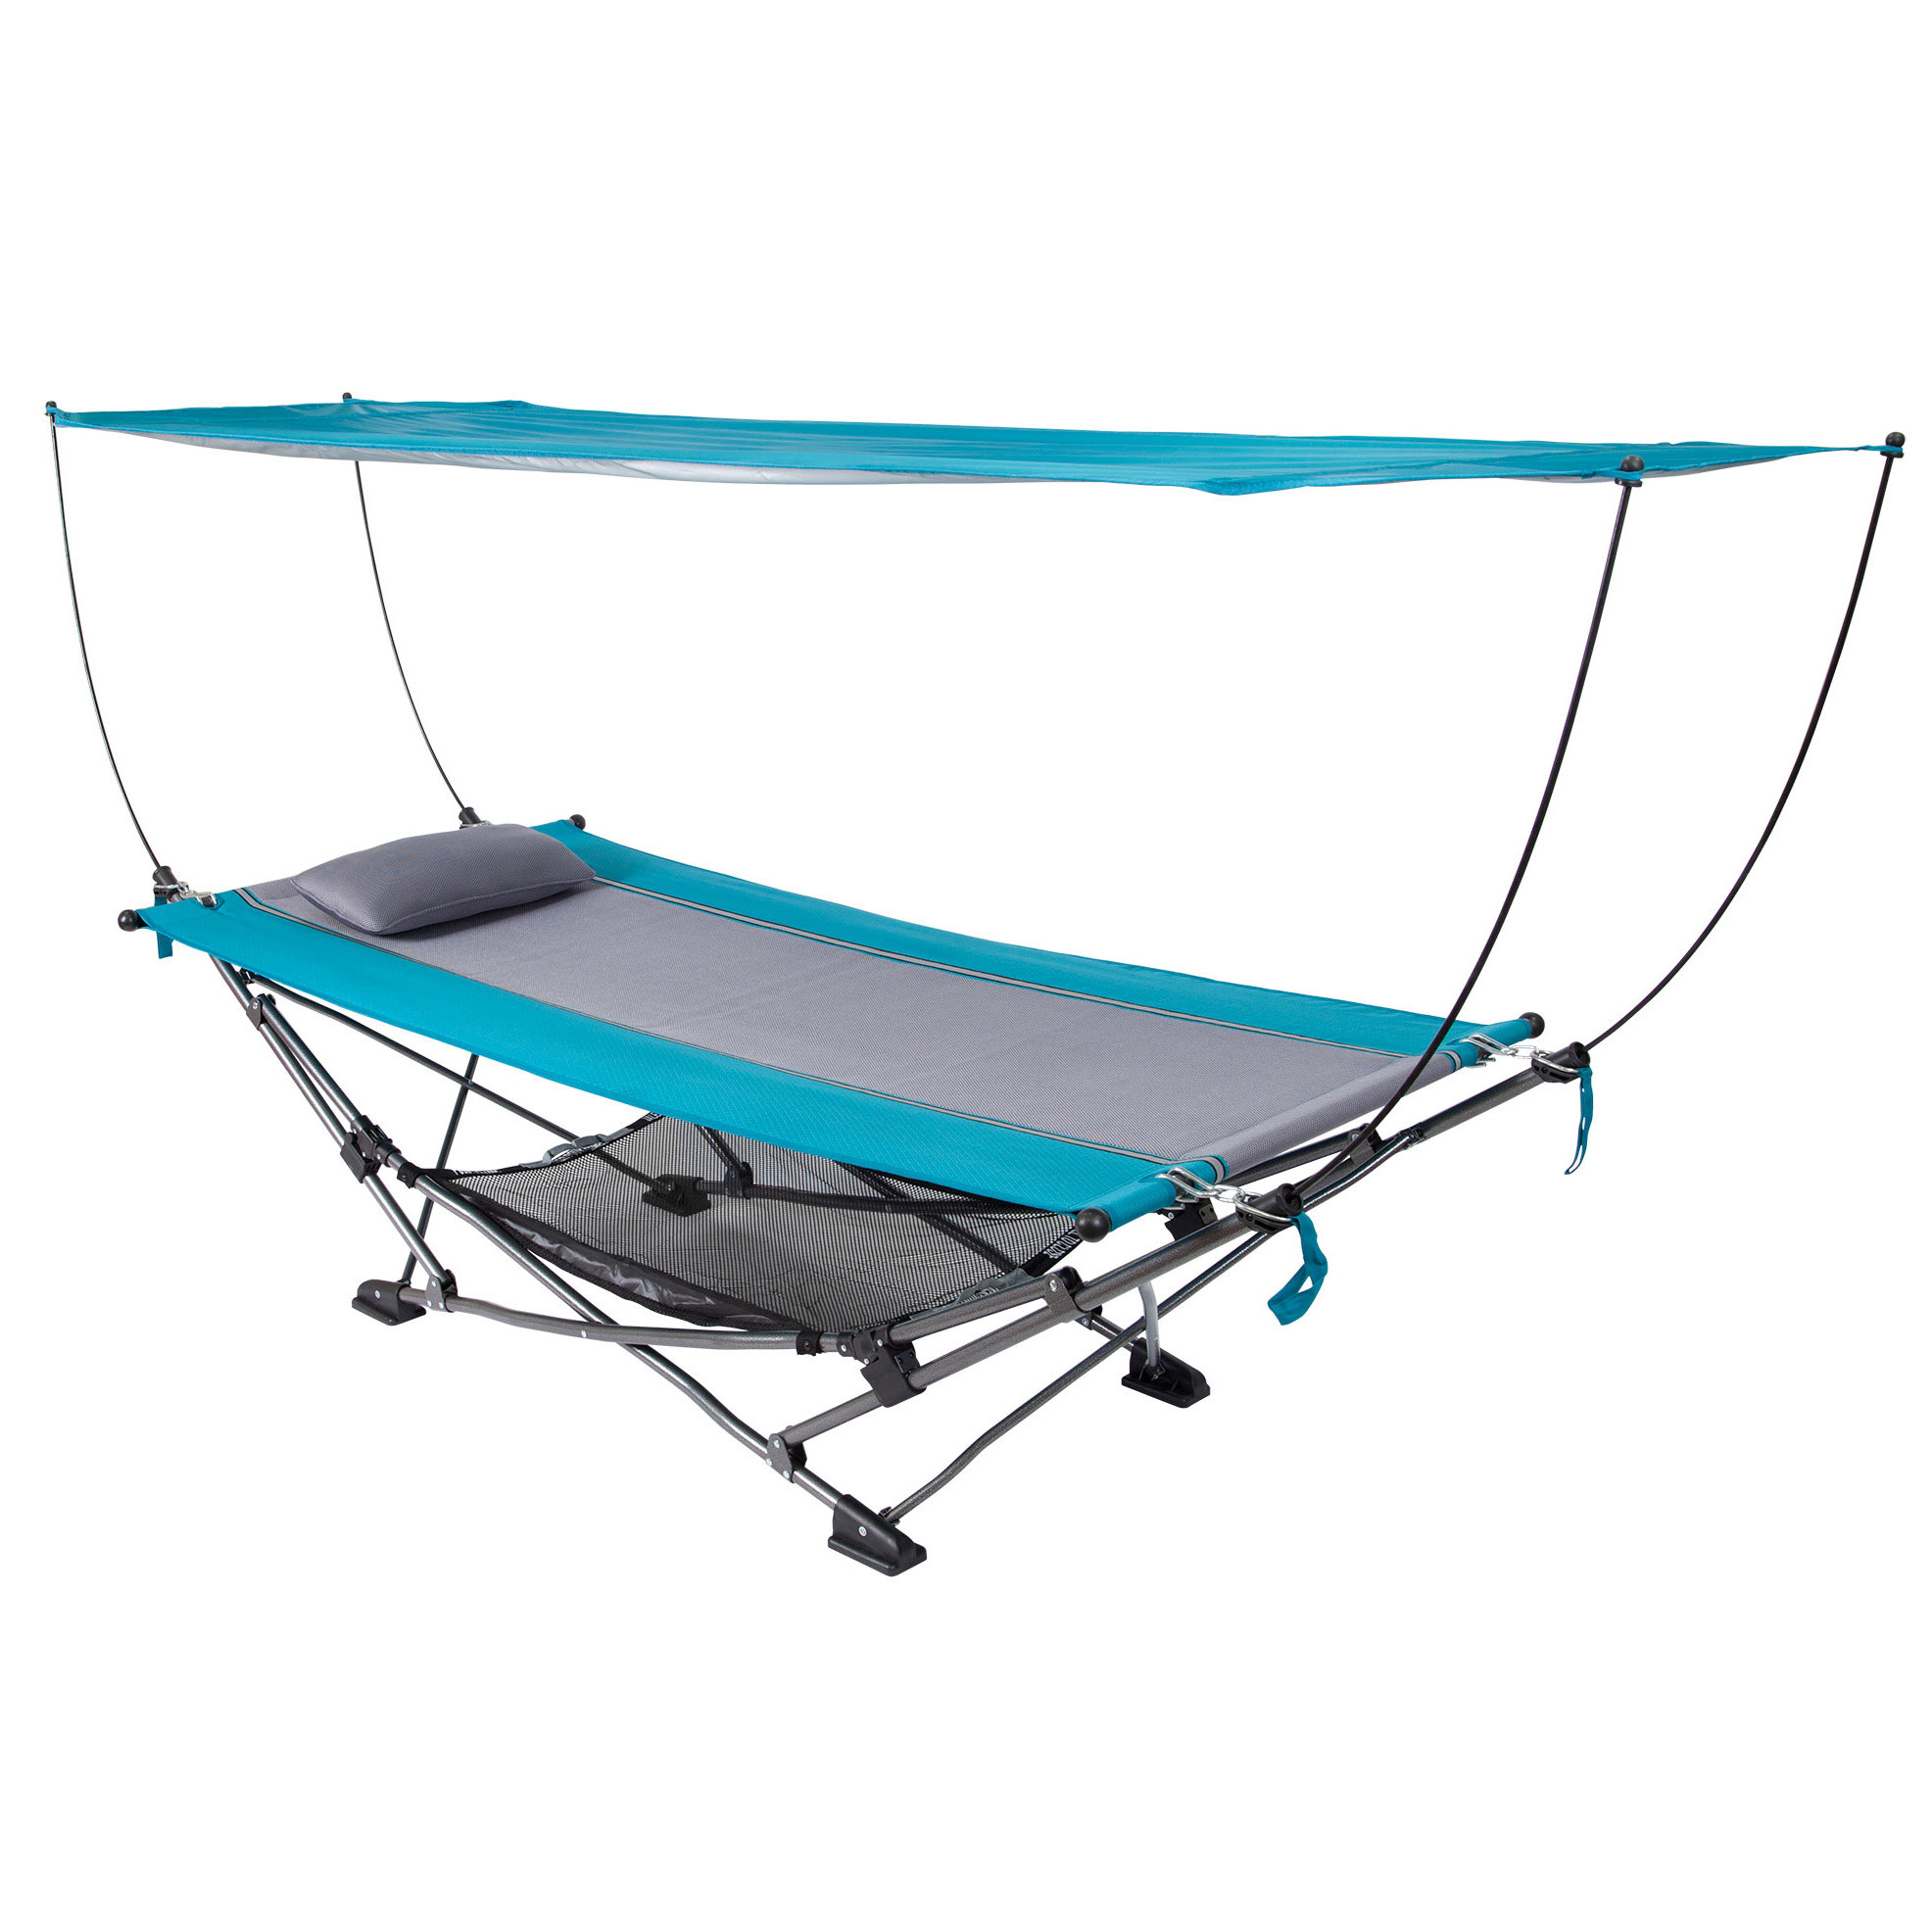 hammock with canopy folding hammock with removable canopy XGXIBTM